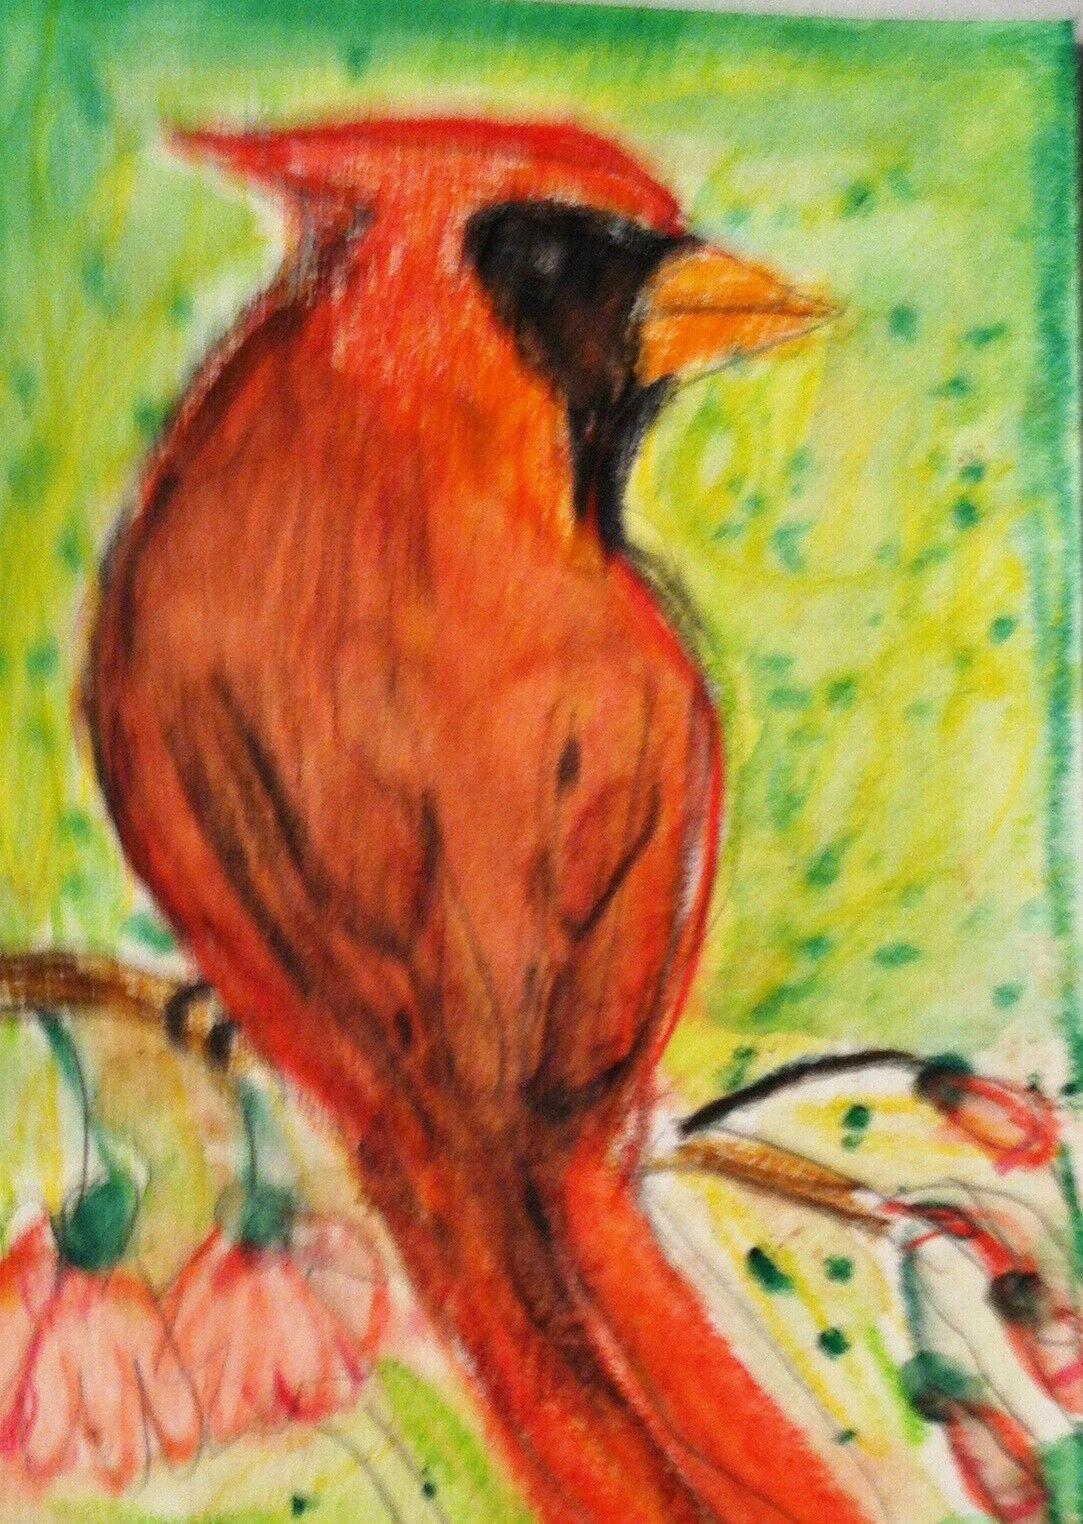 Oil Painting Animal HD Print Canvas Art Wall Decor on Canvas,The bull 24X36inch